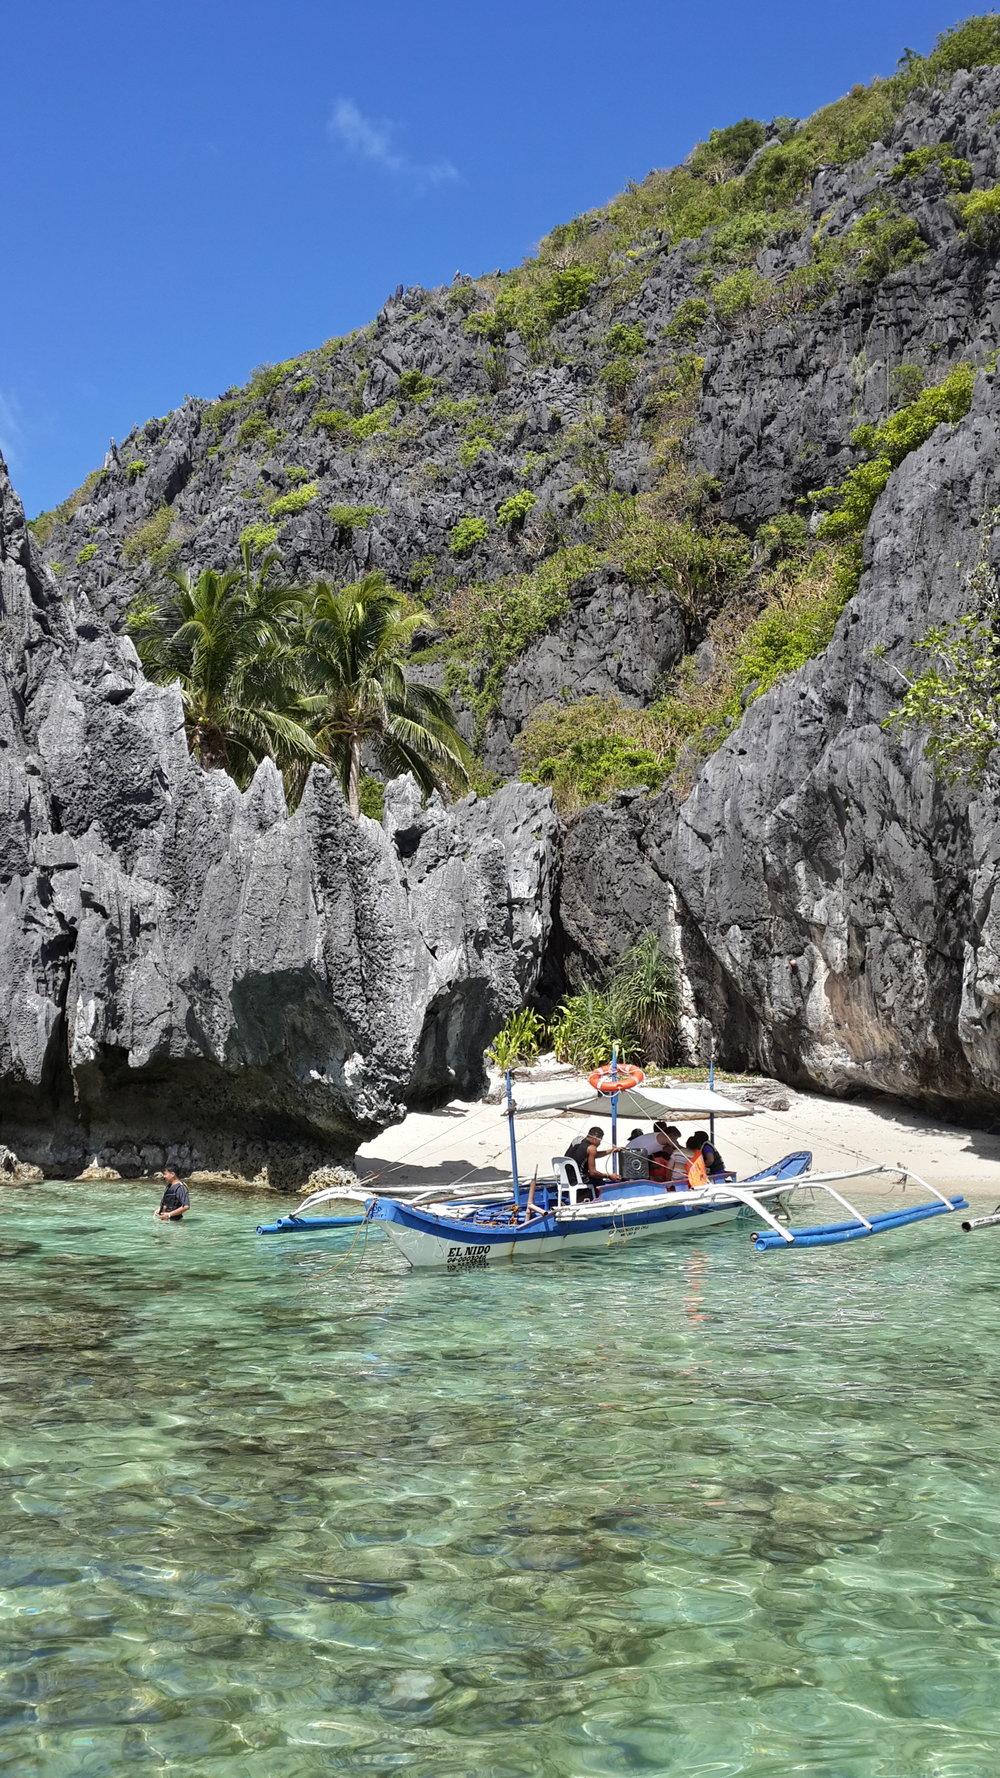 Boat life in Palawan.